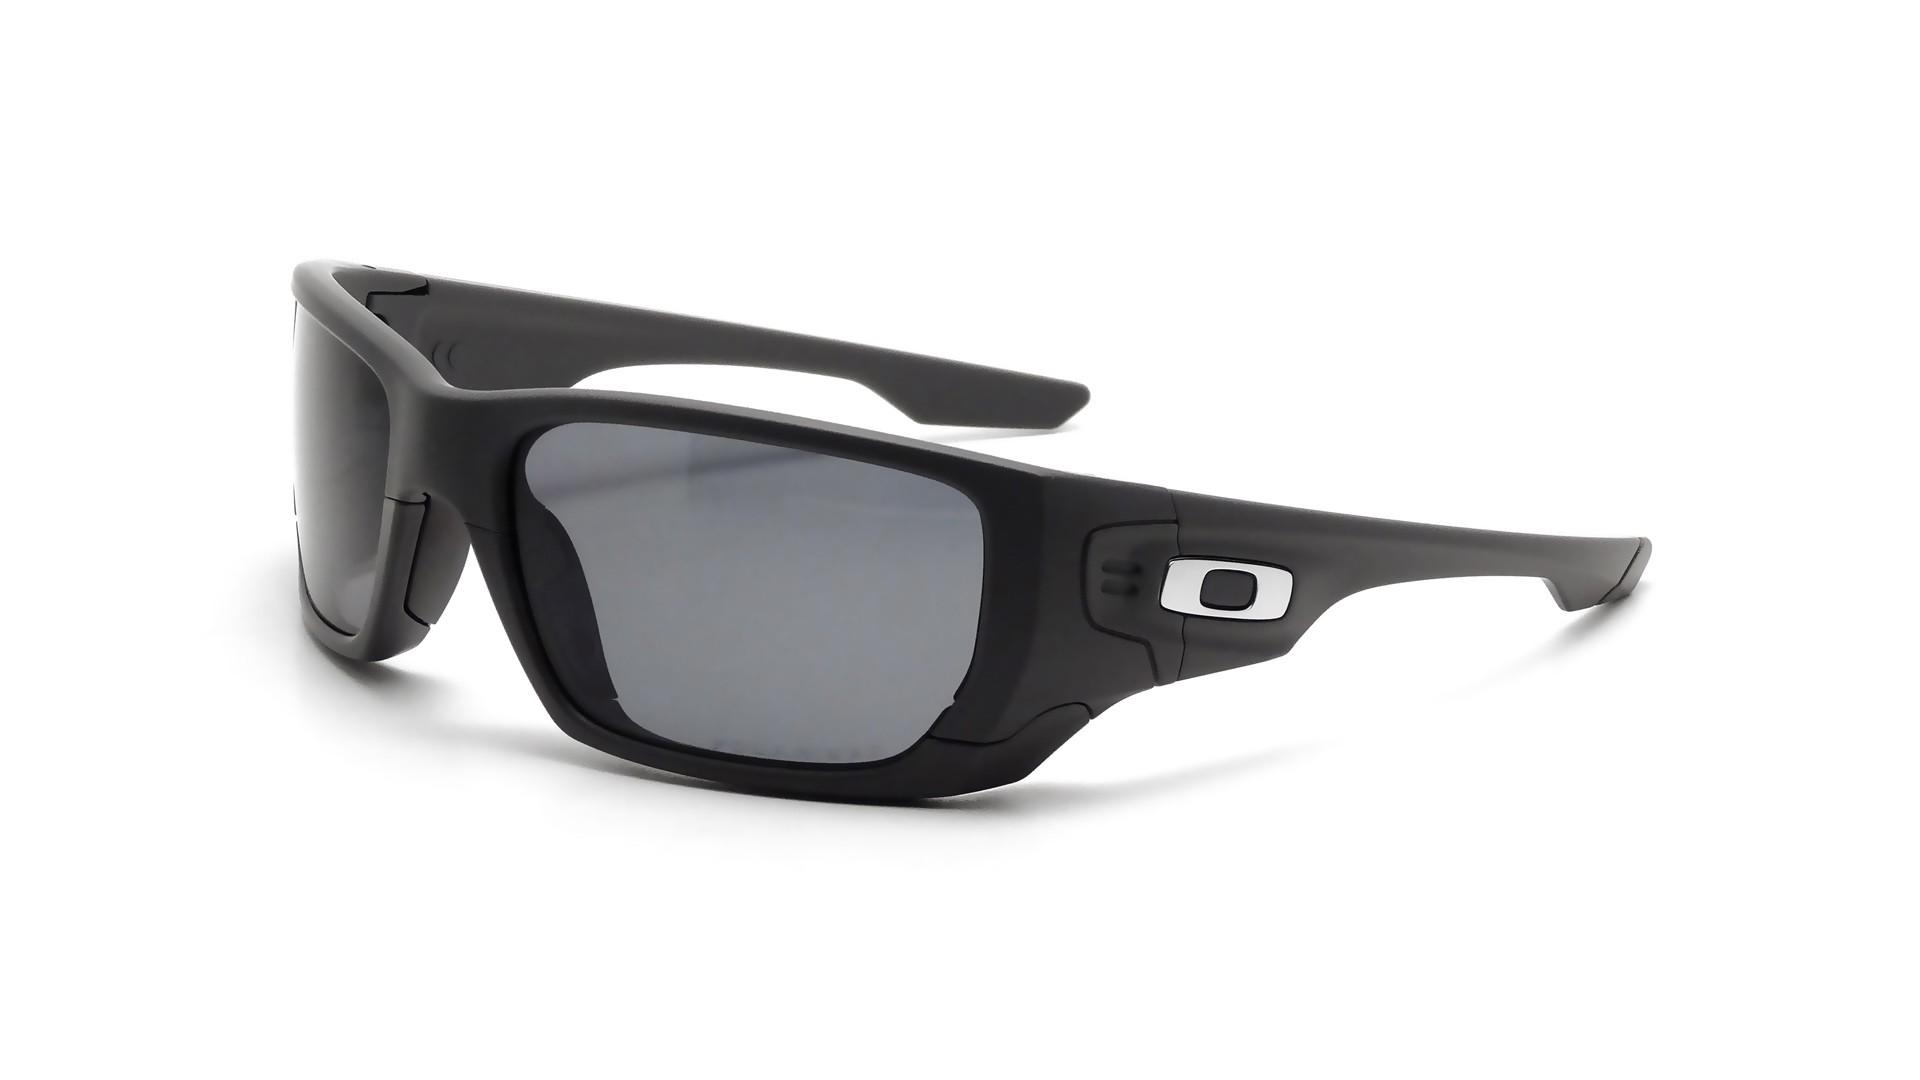 oakley radarlock photochromic lens xtdn  Oakley Style Switch Grey OO9194 07 60-18 Polarized  Visiofactory